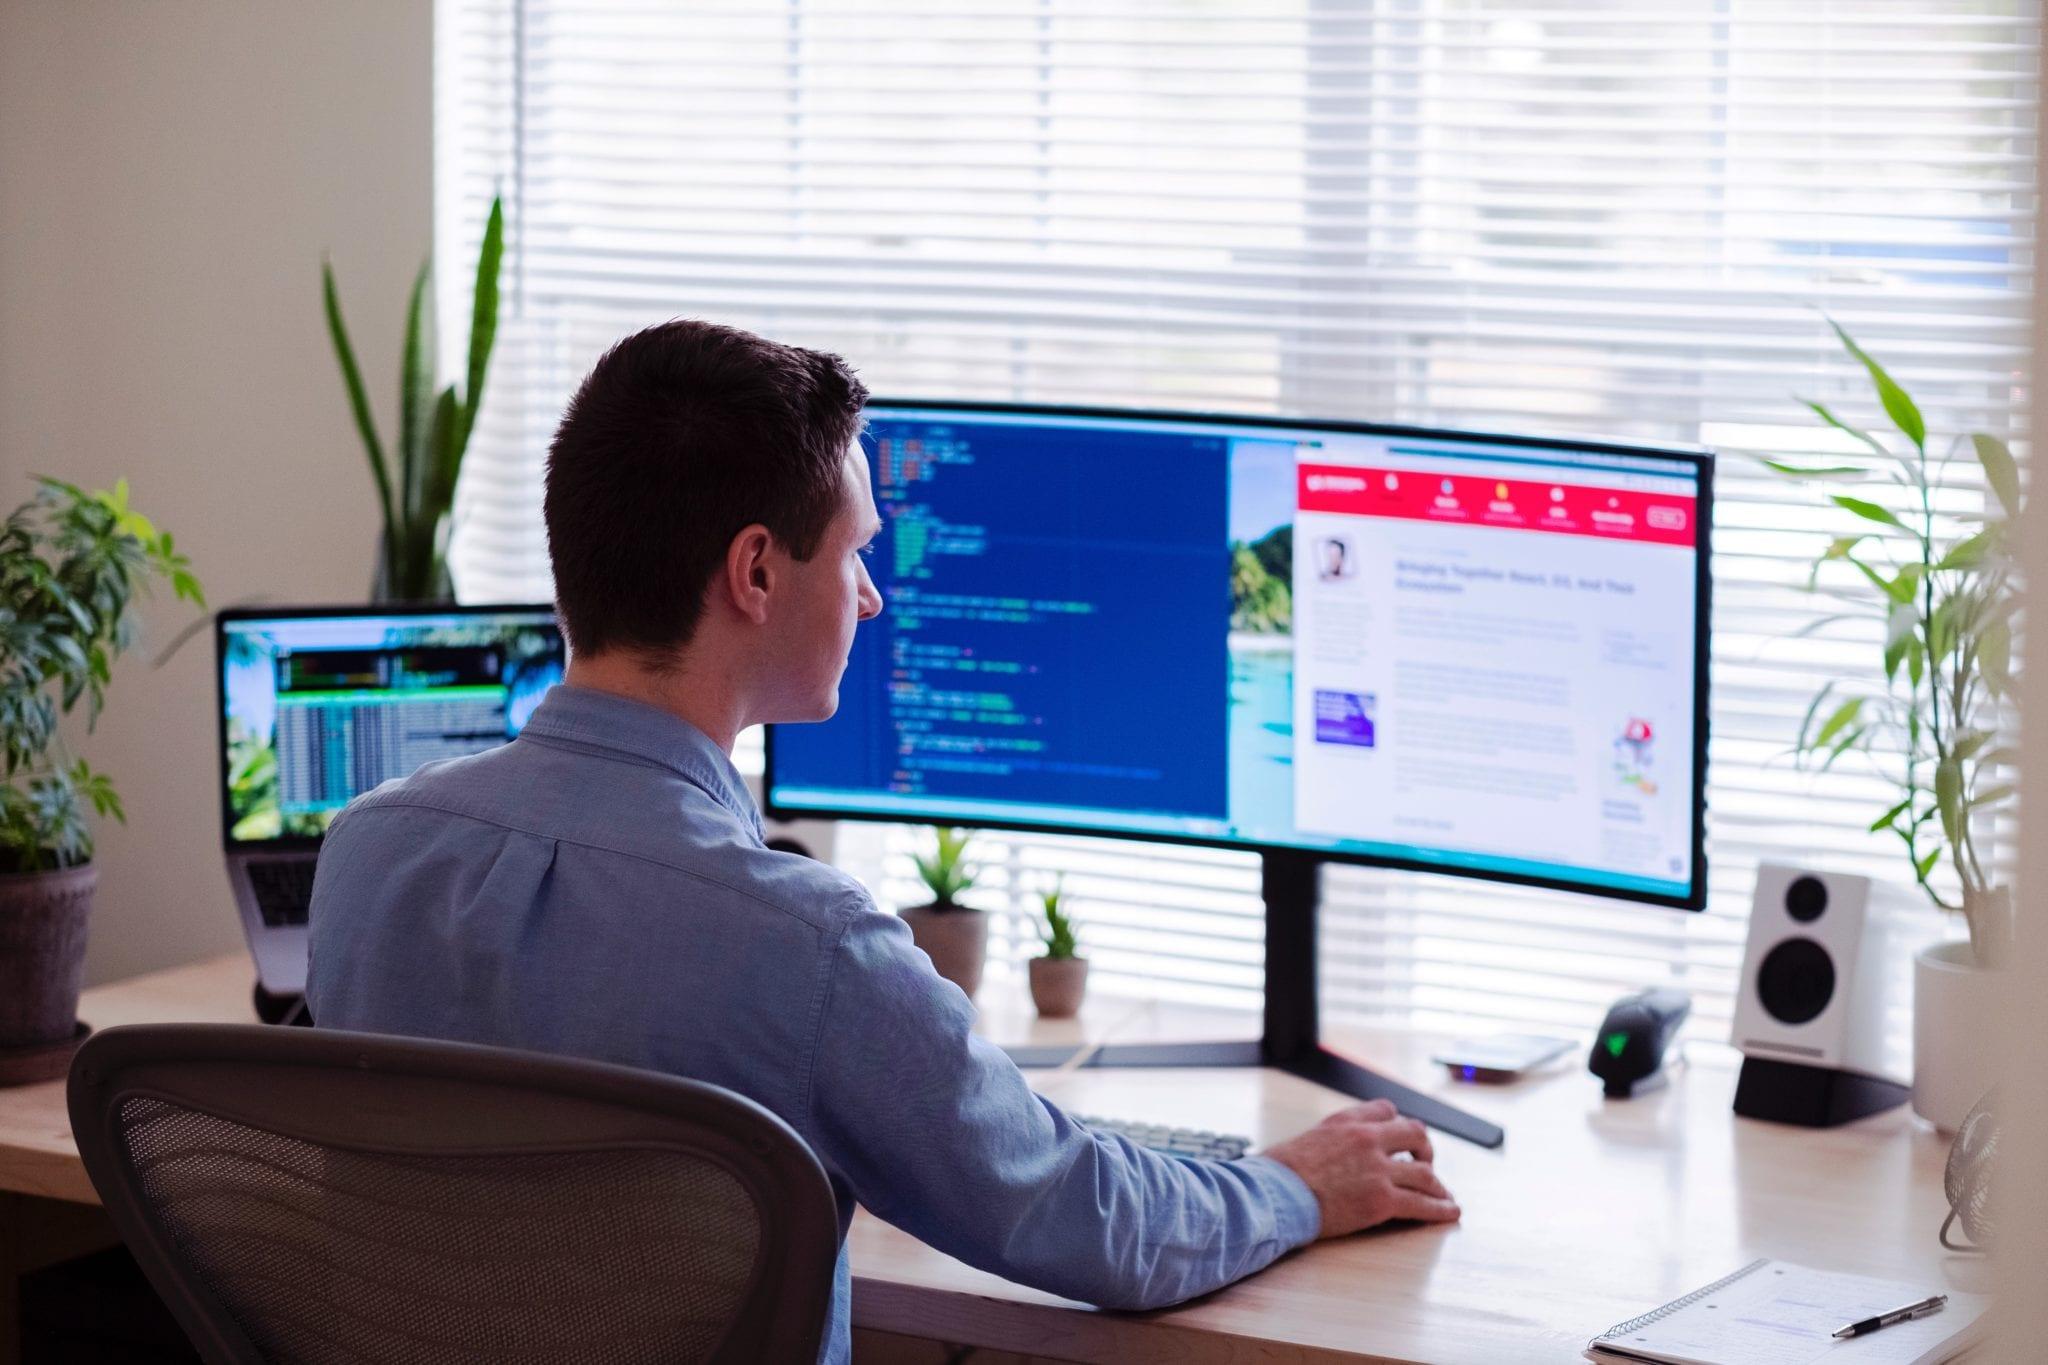 Fleet manager working on construction fleet management on the computer